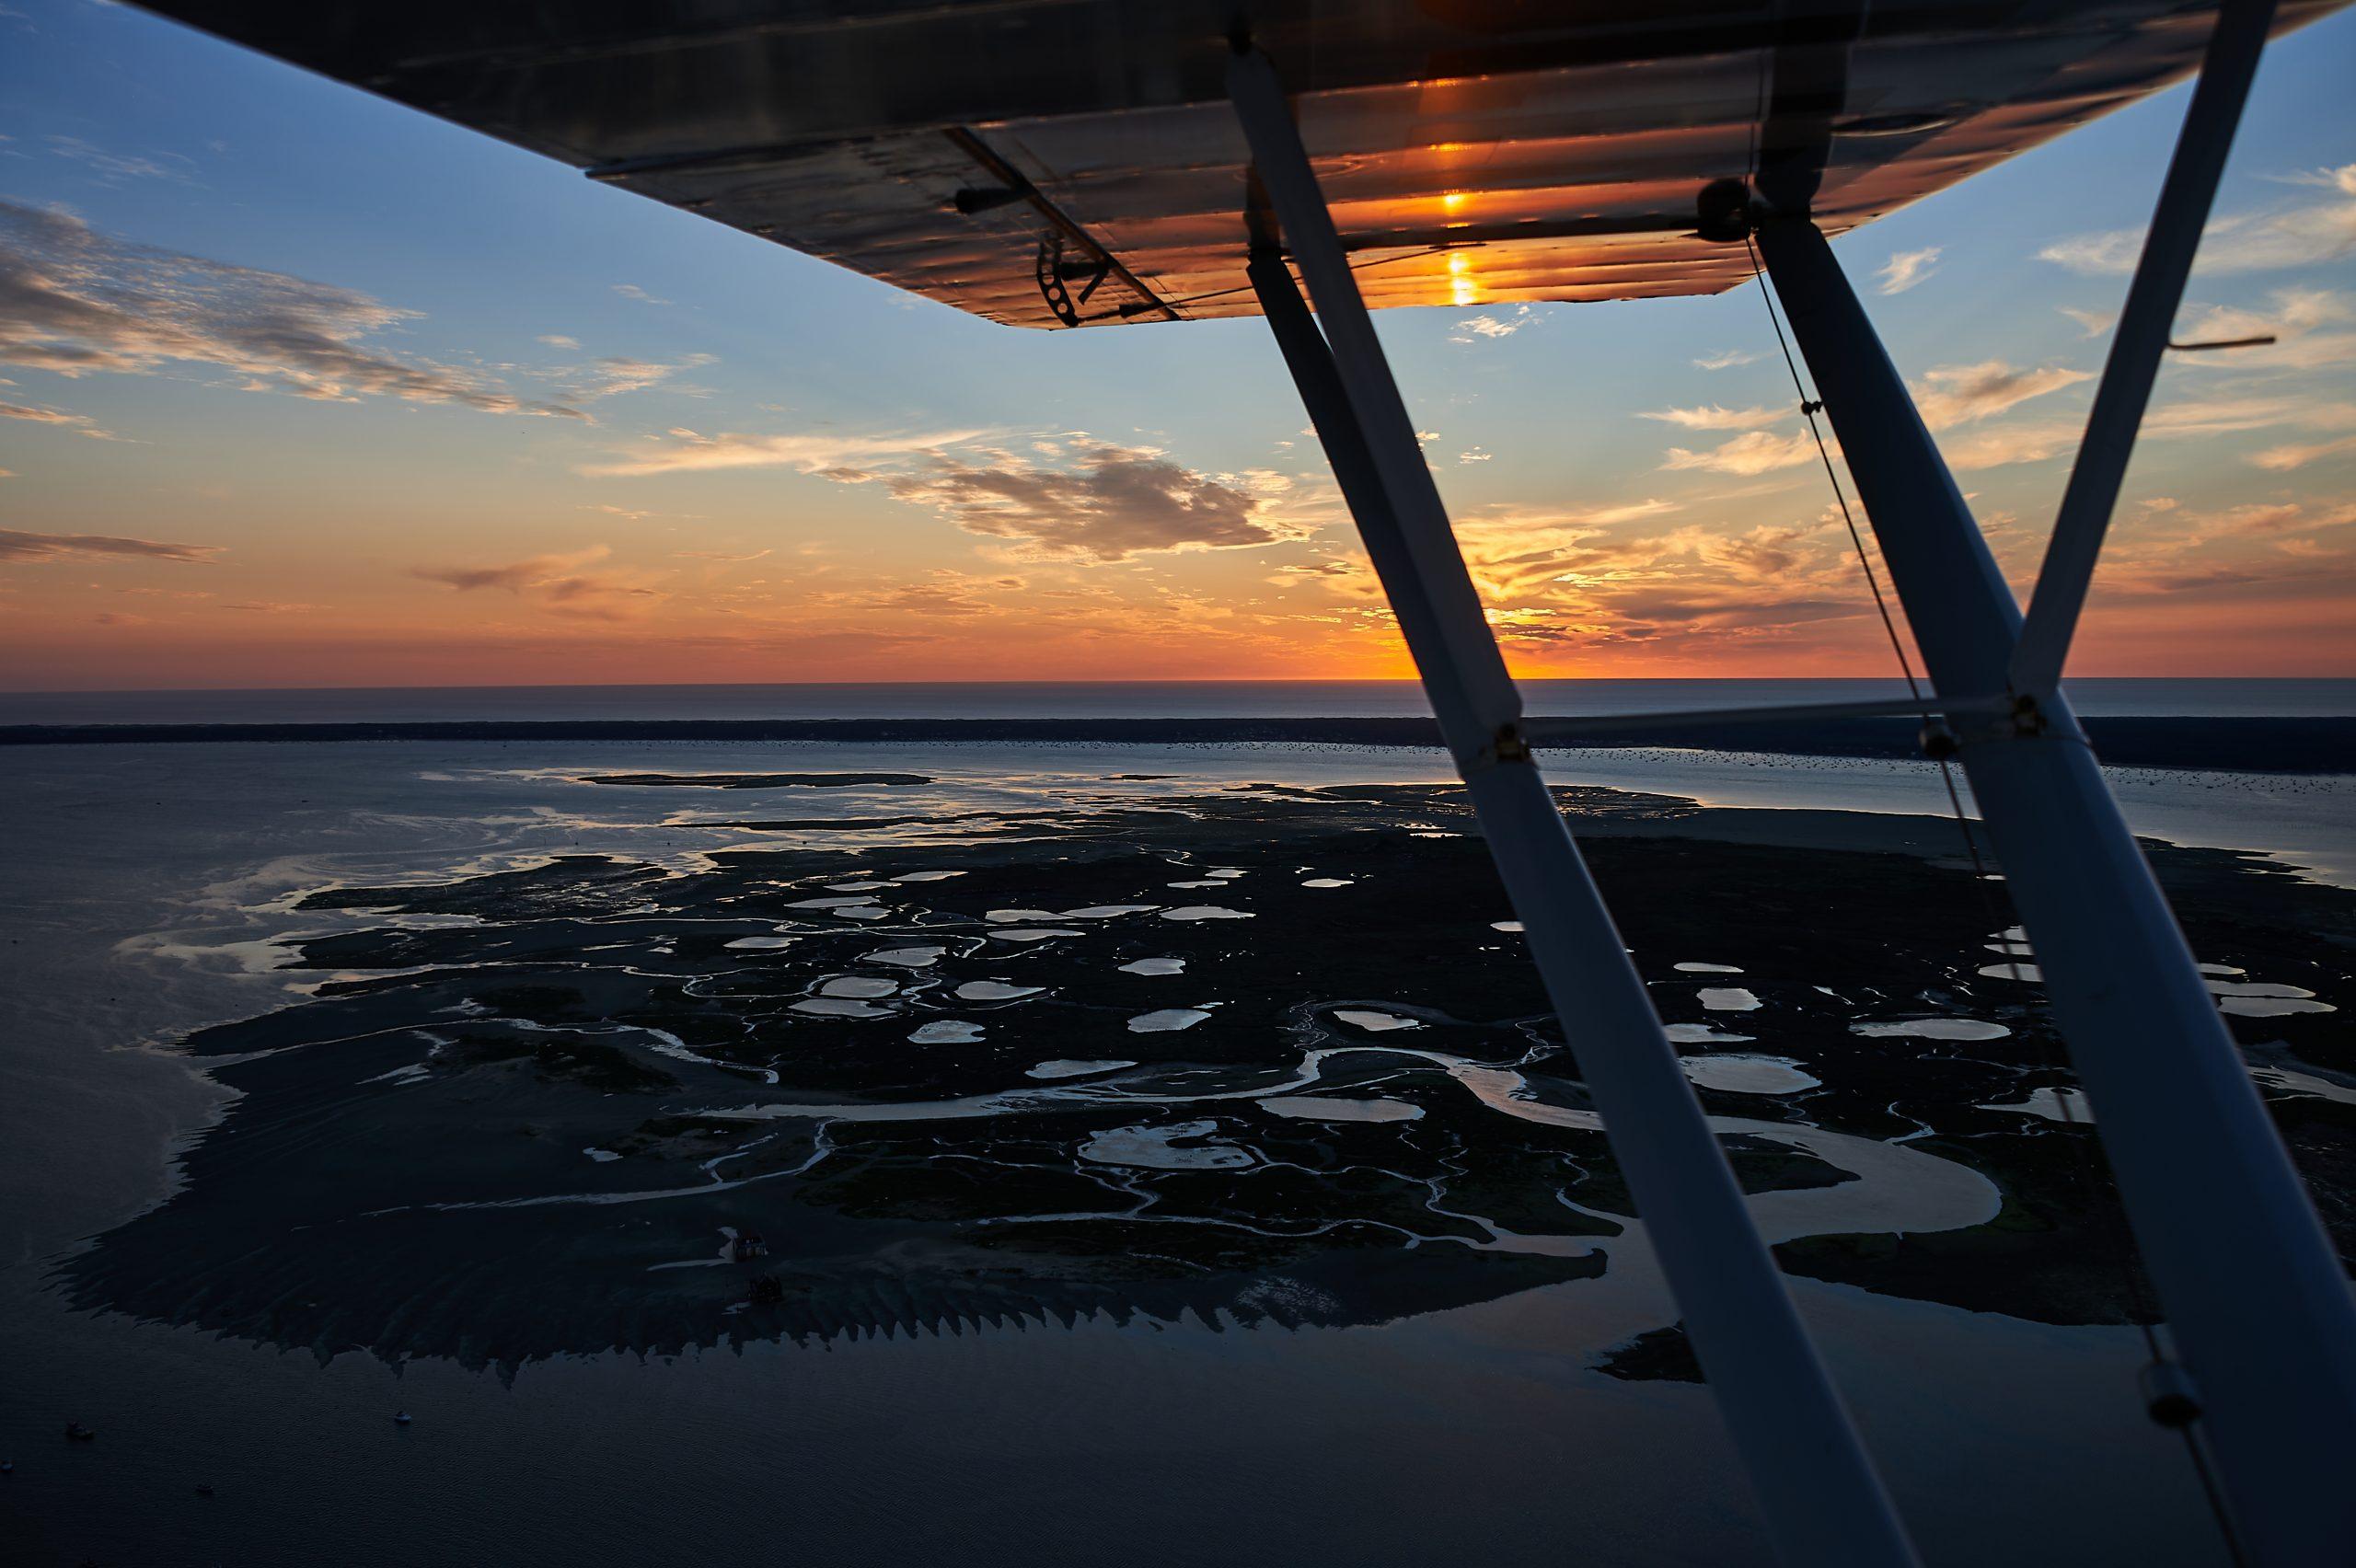 Benjamin Ballande wingtip shot 1 640x426 - Bird Island From A Super Cub